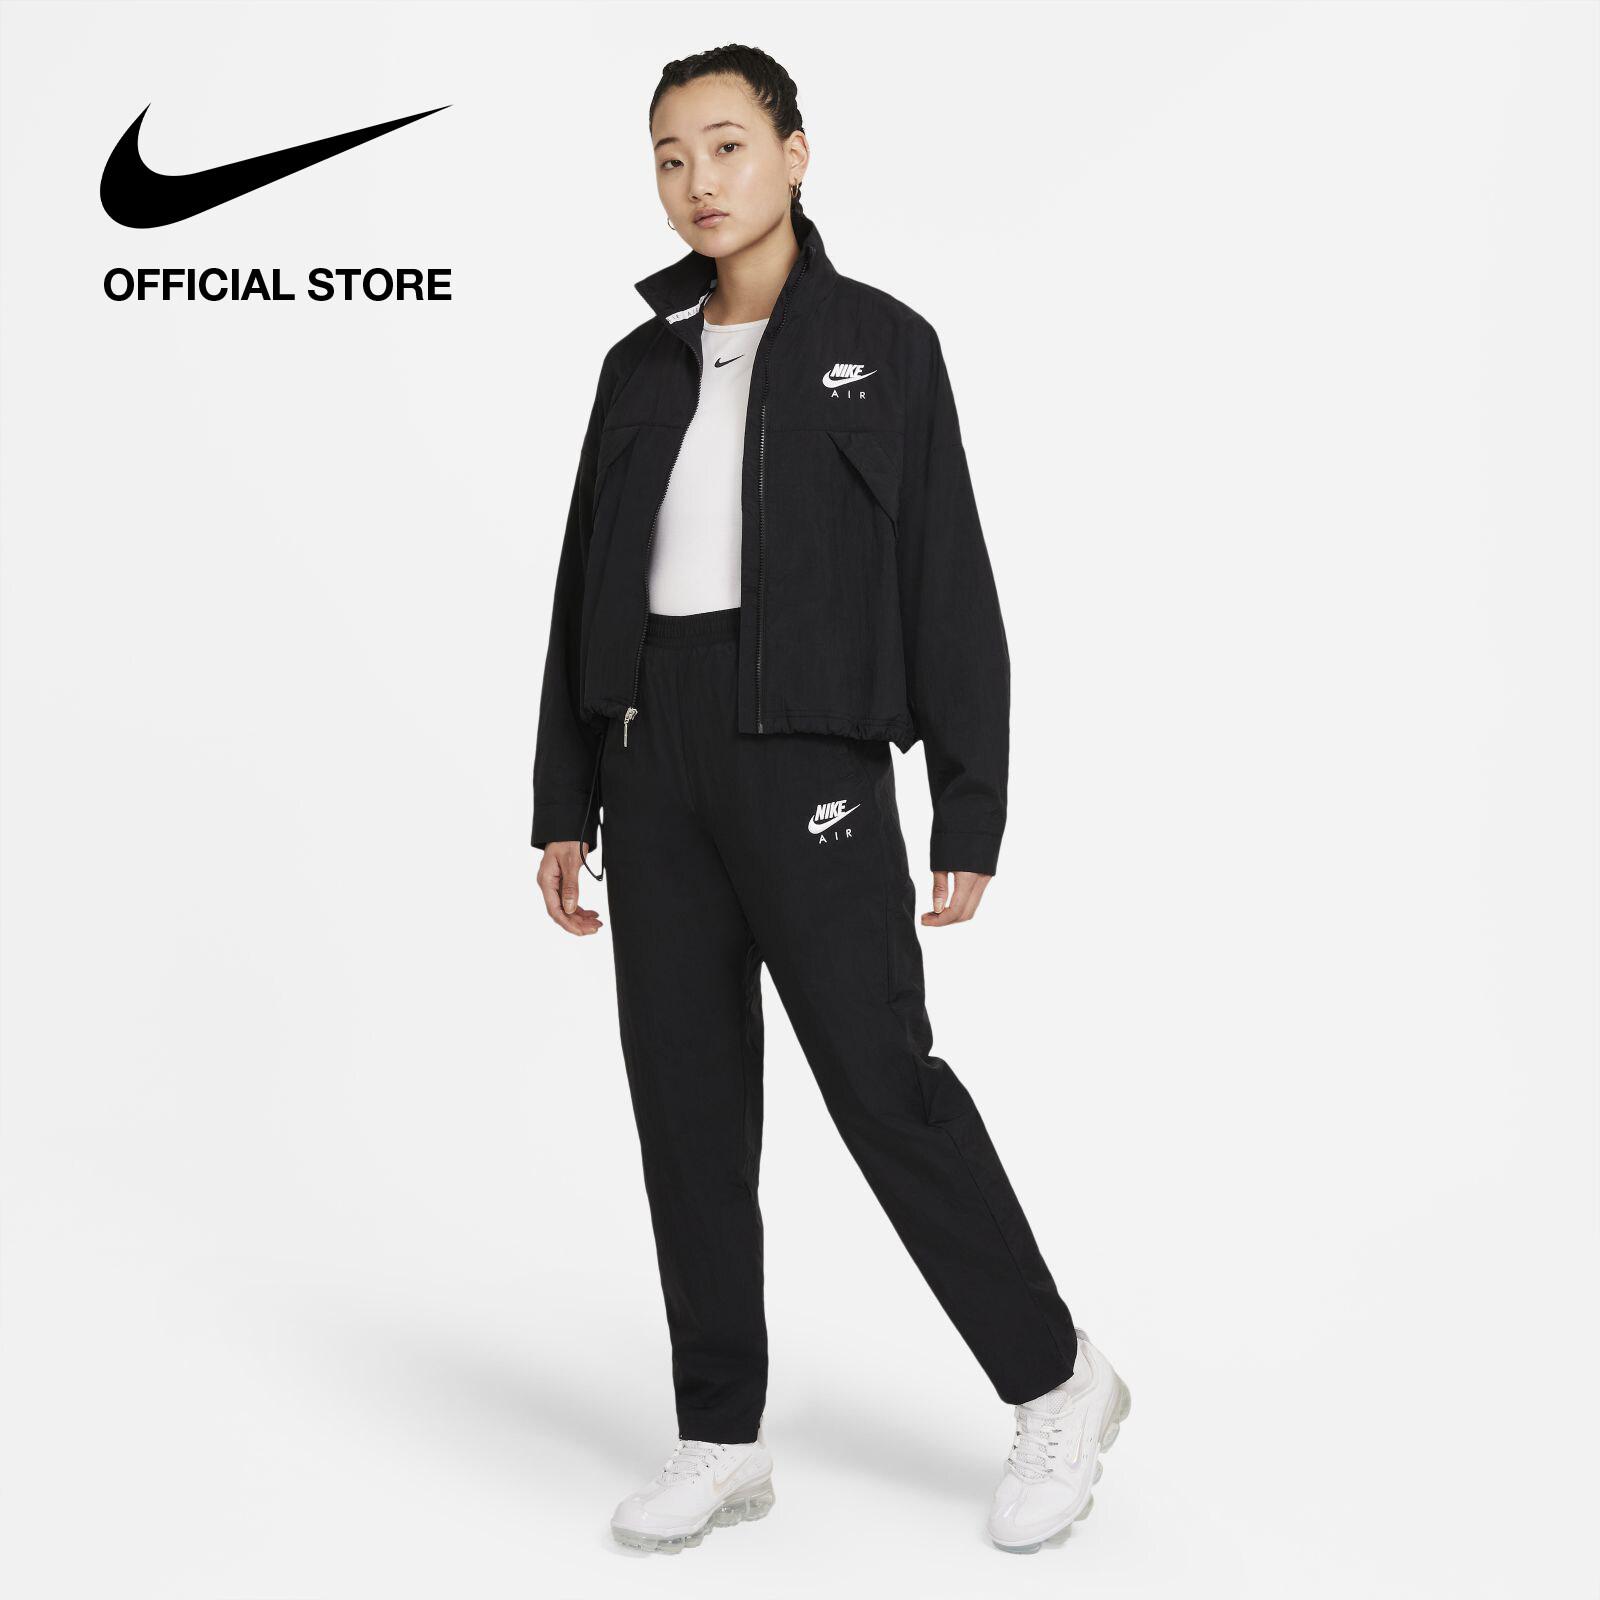 Nike Women's Air Woven Pants - Black ไนกี้ กางเกงขายาวผู้หญิงแบบทอ แอร์ - สีดำ